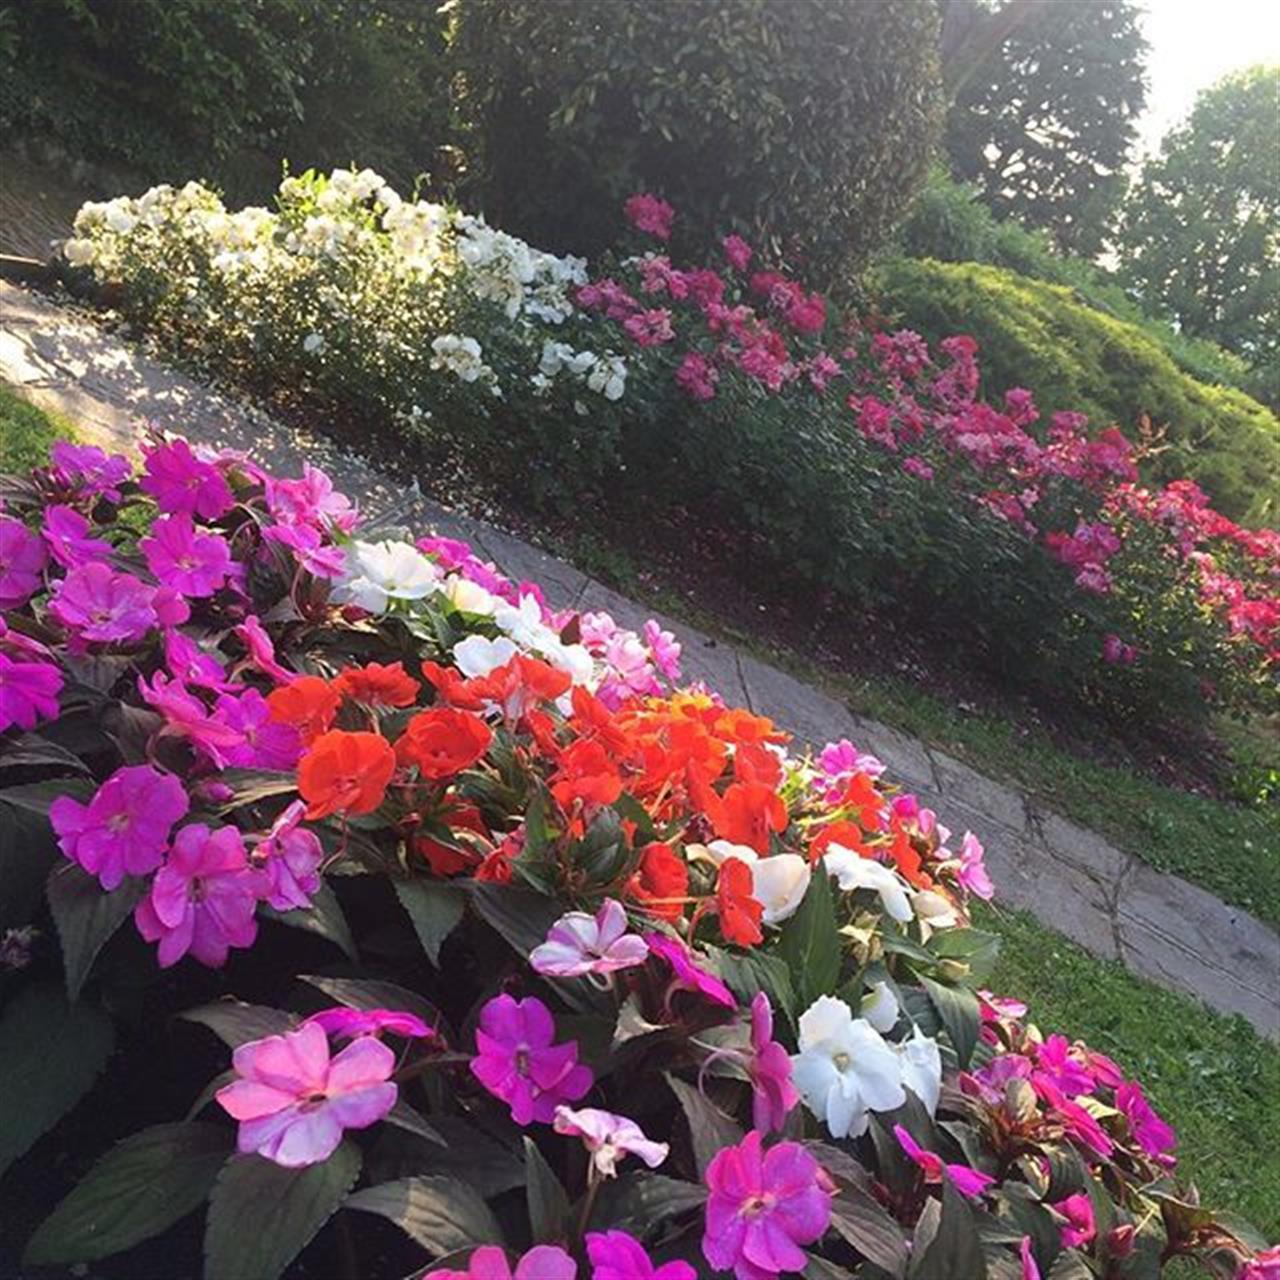 #goodmorning #flowers #brianza #cercocasa #italianlifestyle #leadinrealestatecompaniesoftheworld #leadingrelocal #househunting #buongiorno #colors #solocosebelle #happydays #smile #anzanodelparco #villeinvendita #como